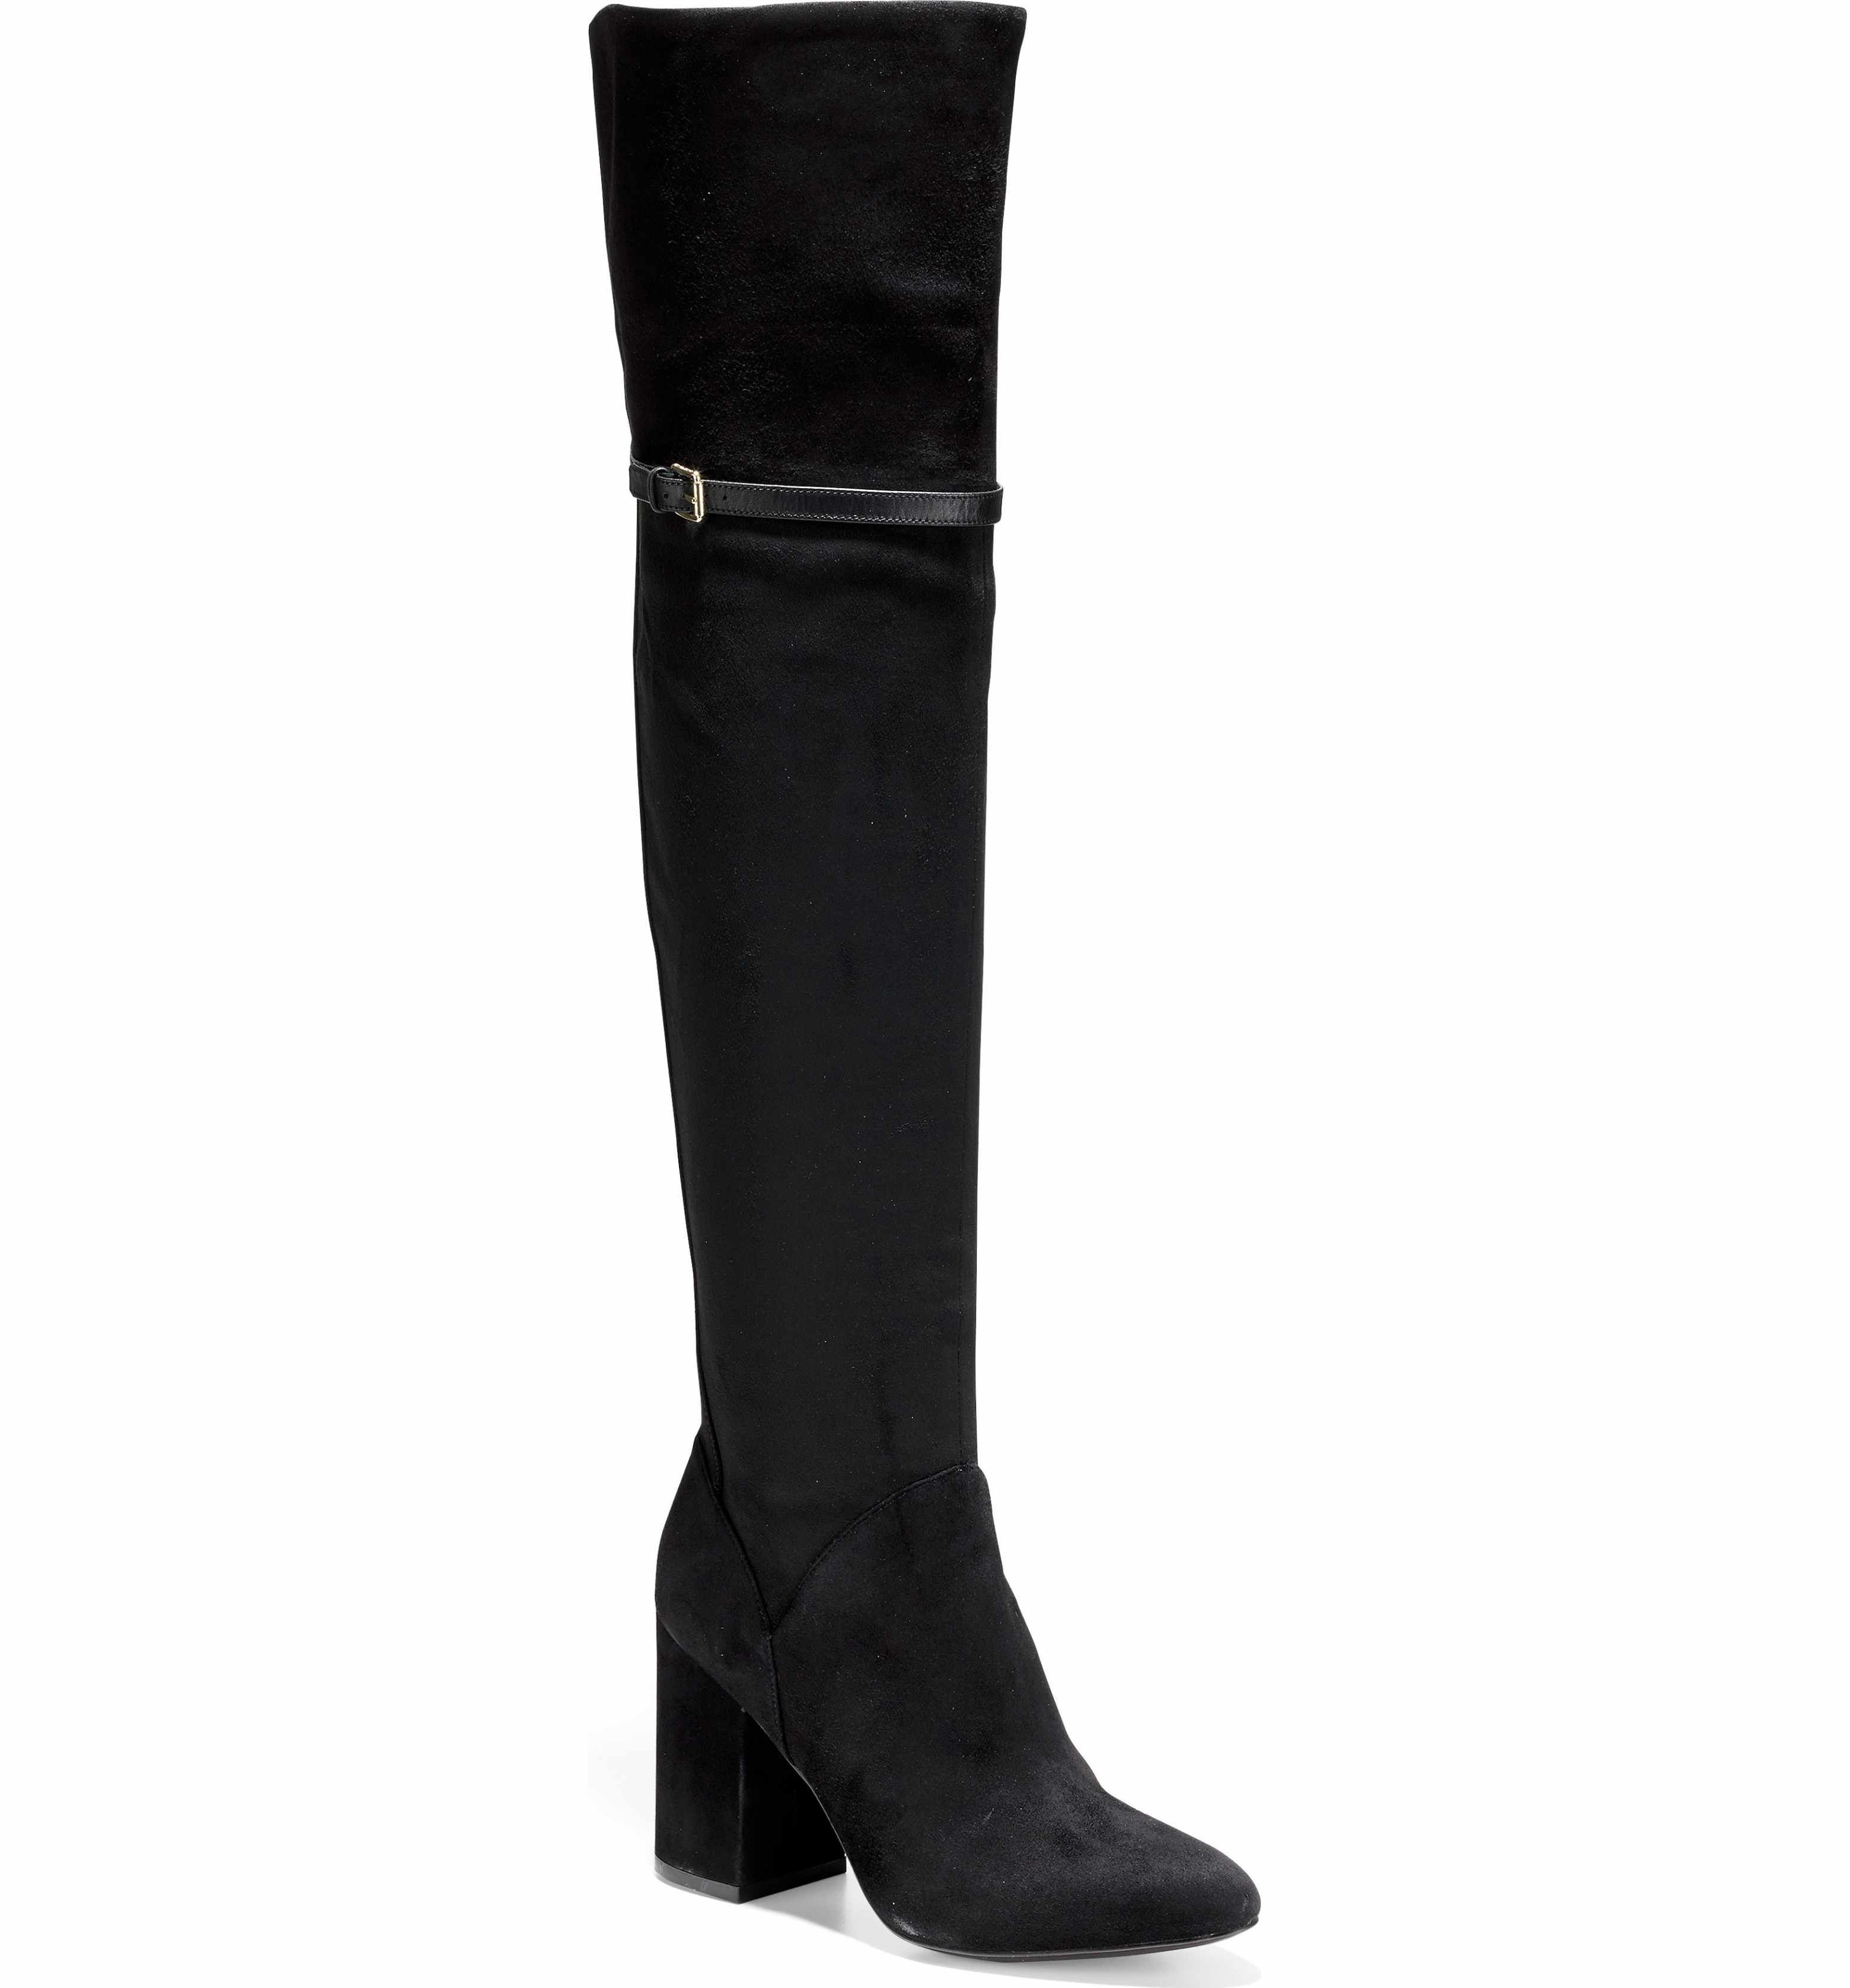 c1cc260717d High Heel. Main Image - Cole Haan Darcia Over the Knee Boot (Women) Soft  Suede